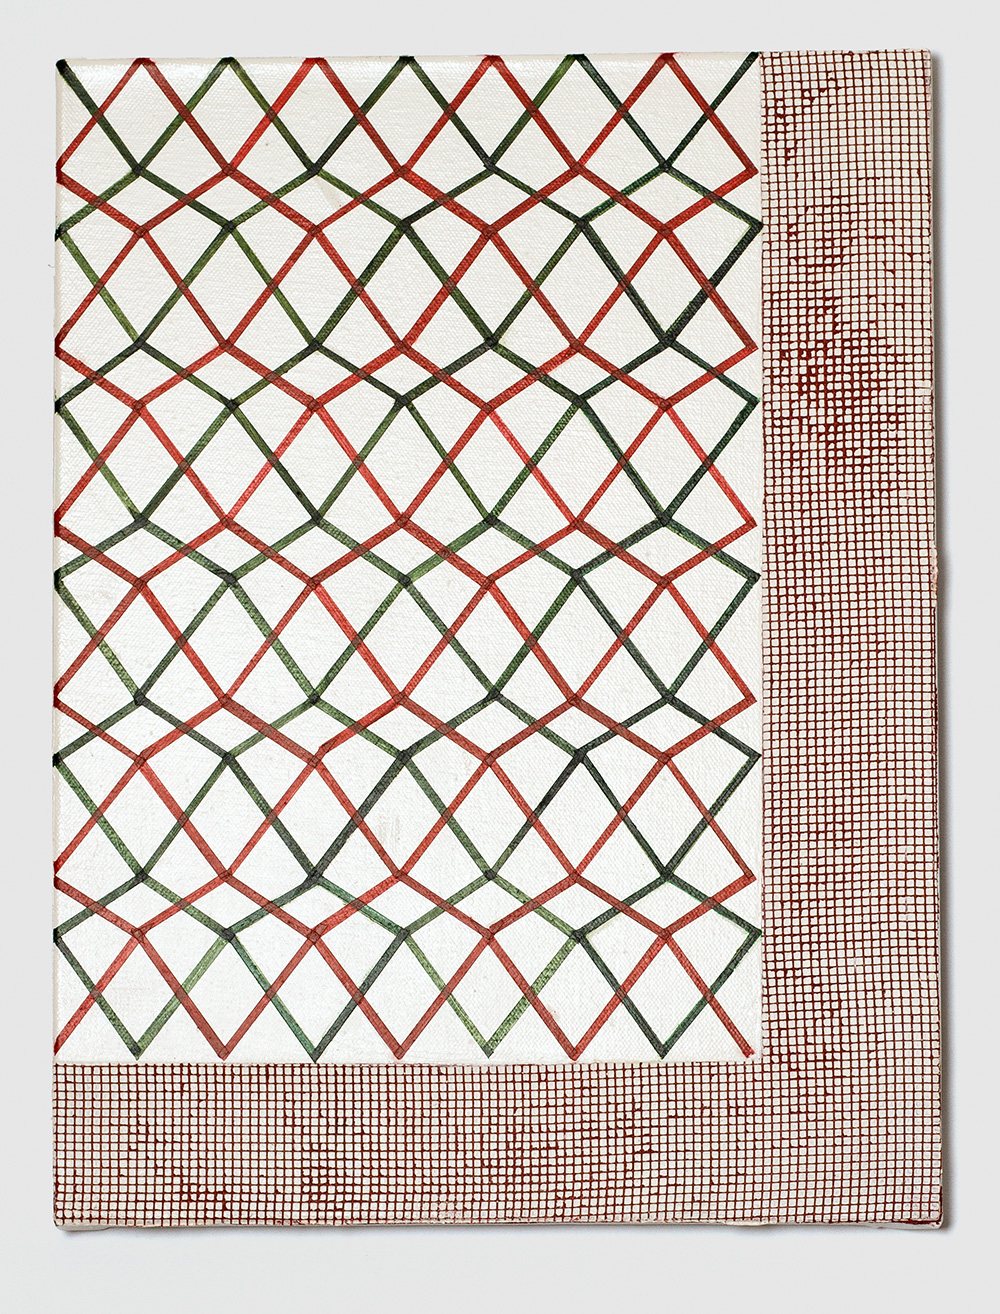 Adia Wahid   Background Noise , 2017  Acrylic on Canvas  40cm x 30cm